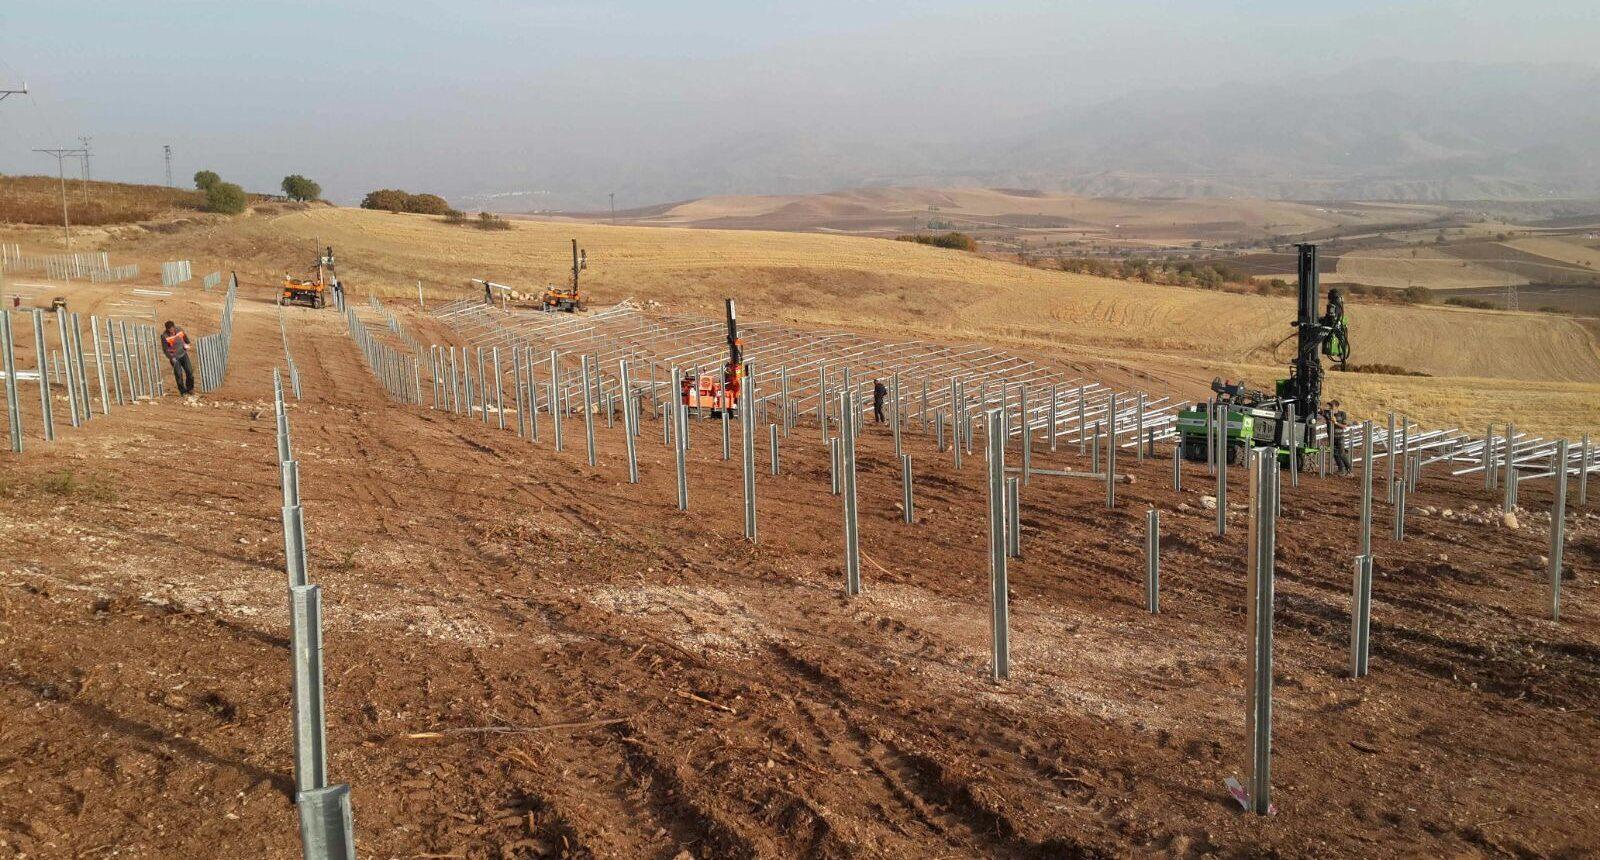 Arazi Üzeri Ges 7- Heran Enerji